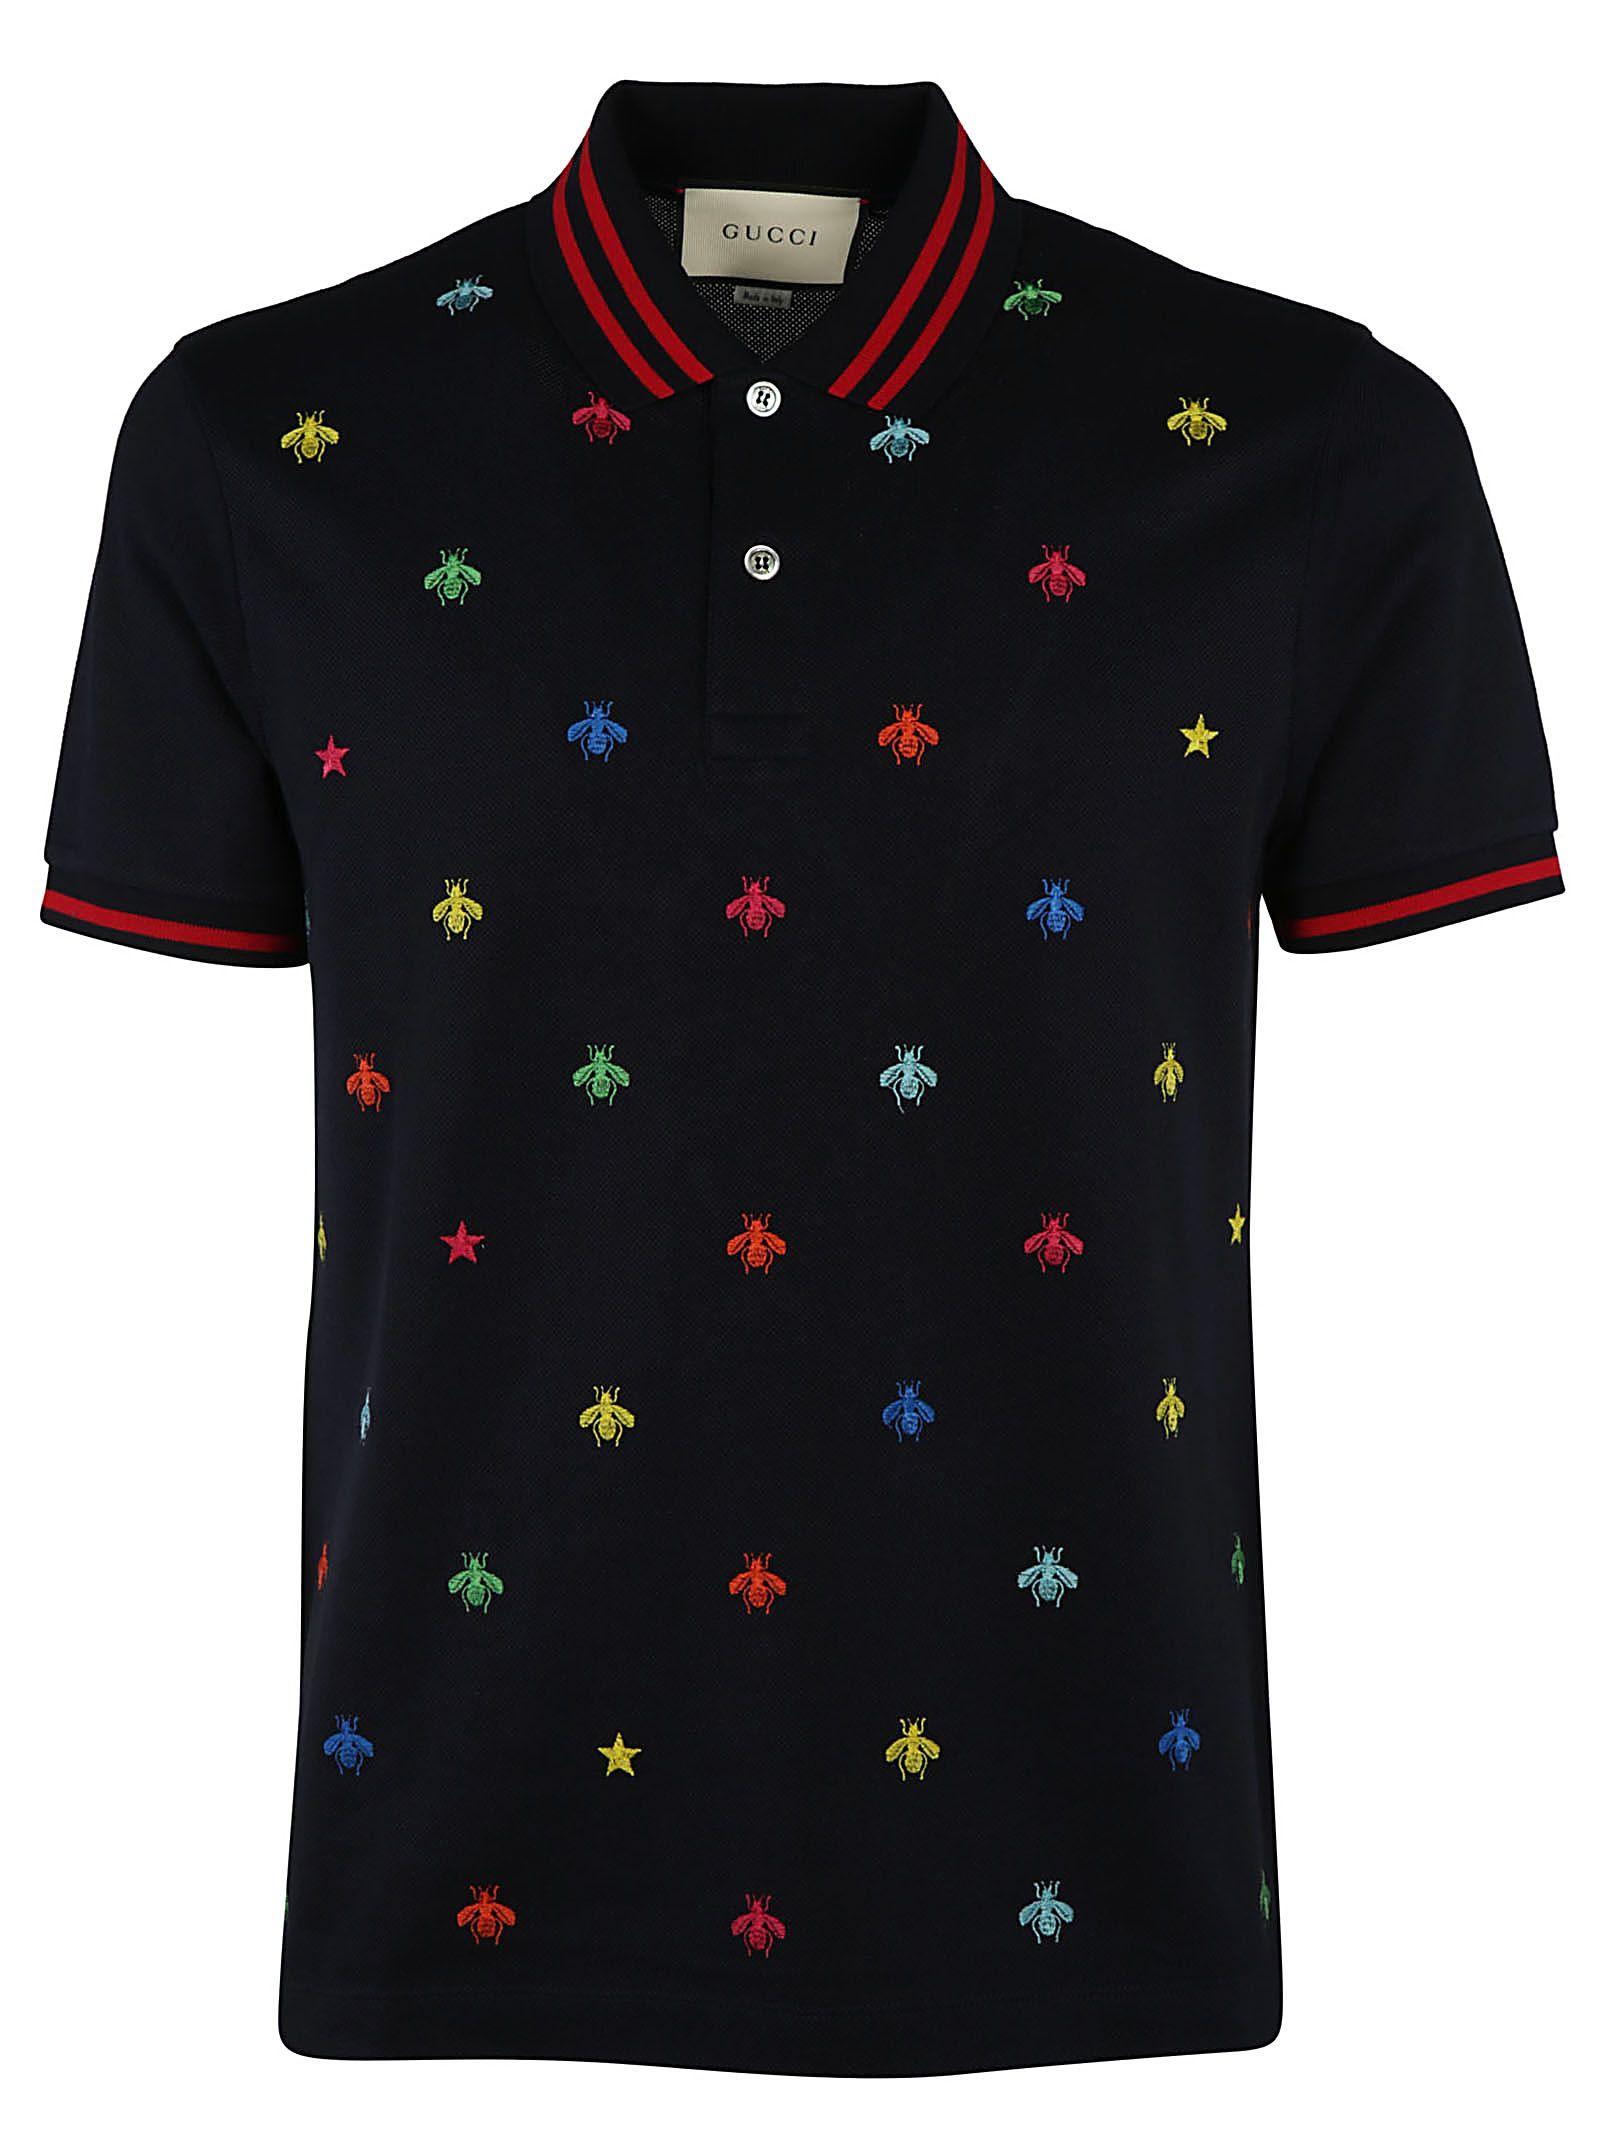 Gucci Bees And Stars Polo Shirt